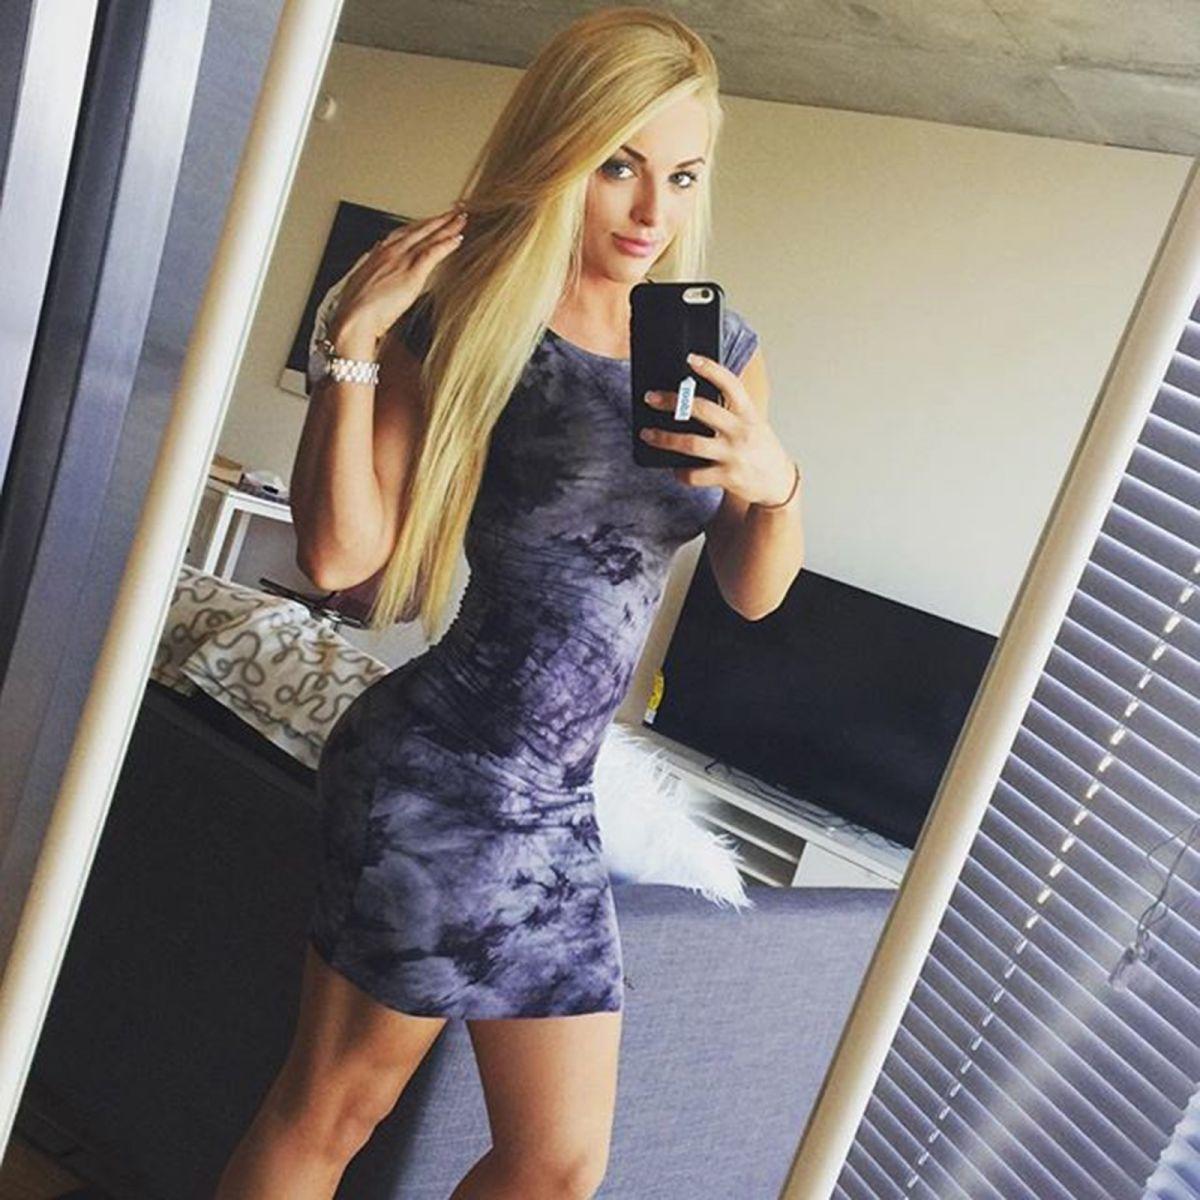 Mandy Rose Instagram